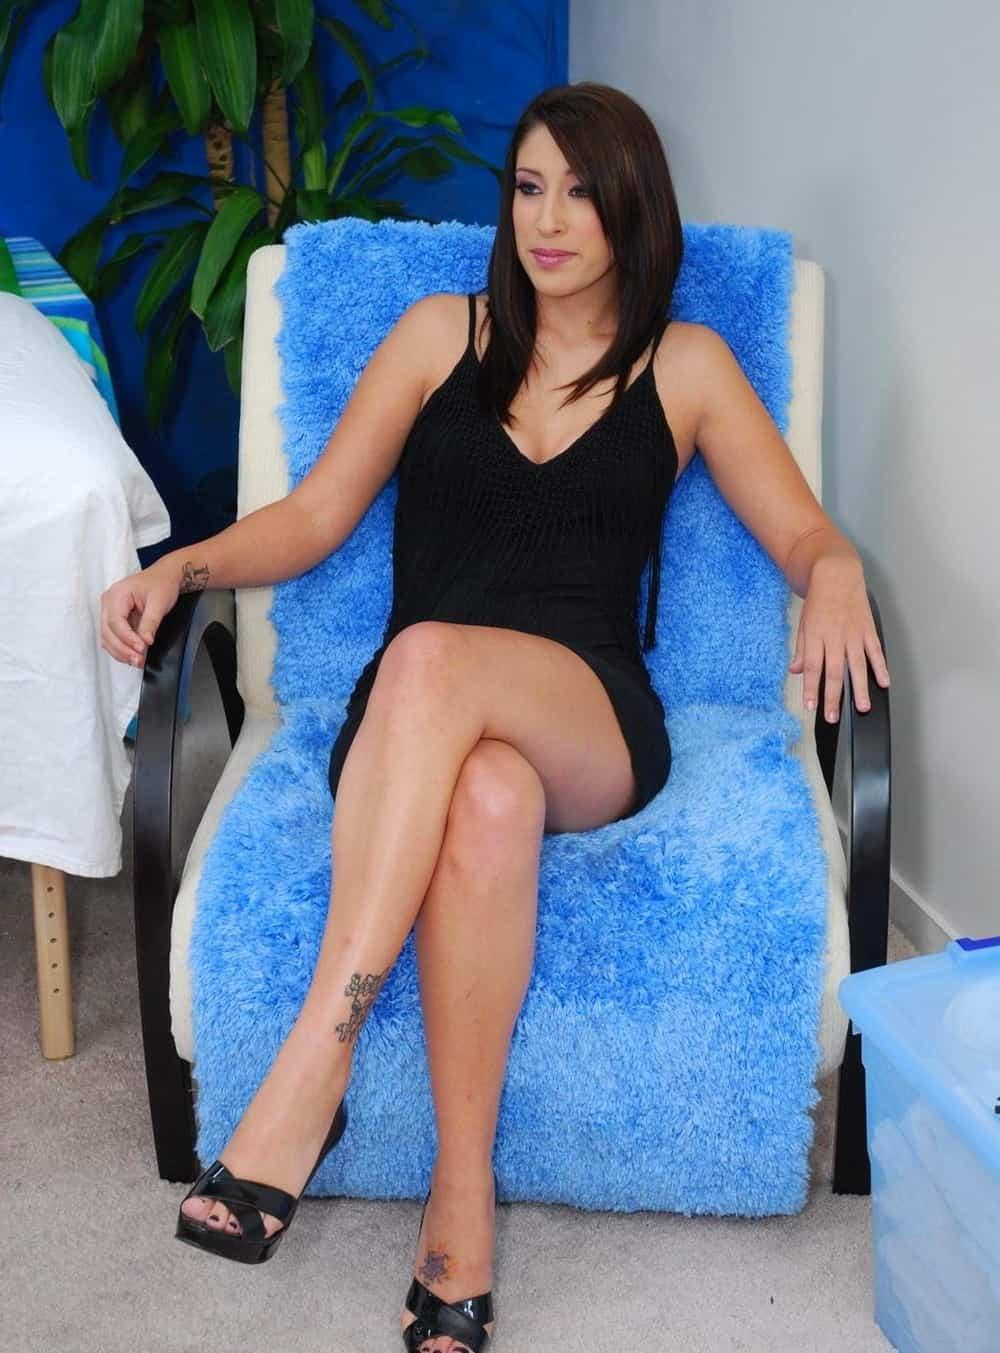 Abby Porn Actress abby lane - free pics, videos & biography